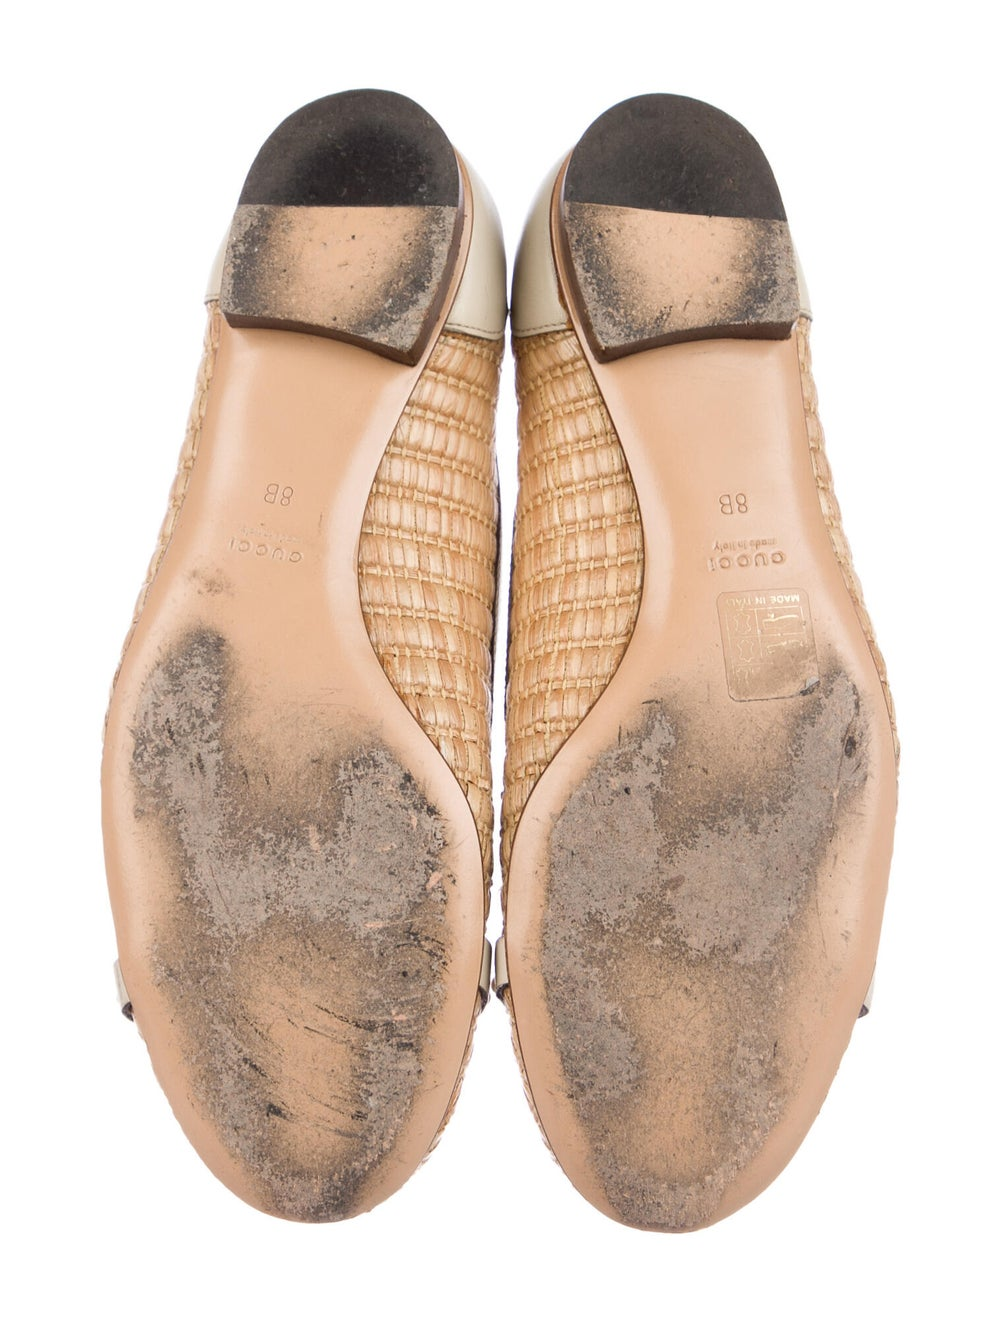 Gucci Horsebit Accent Colorblock Pattern Ballet F… - image 5